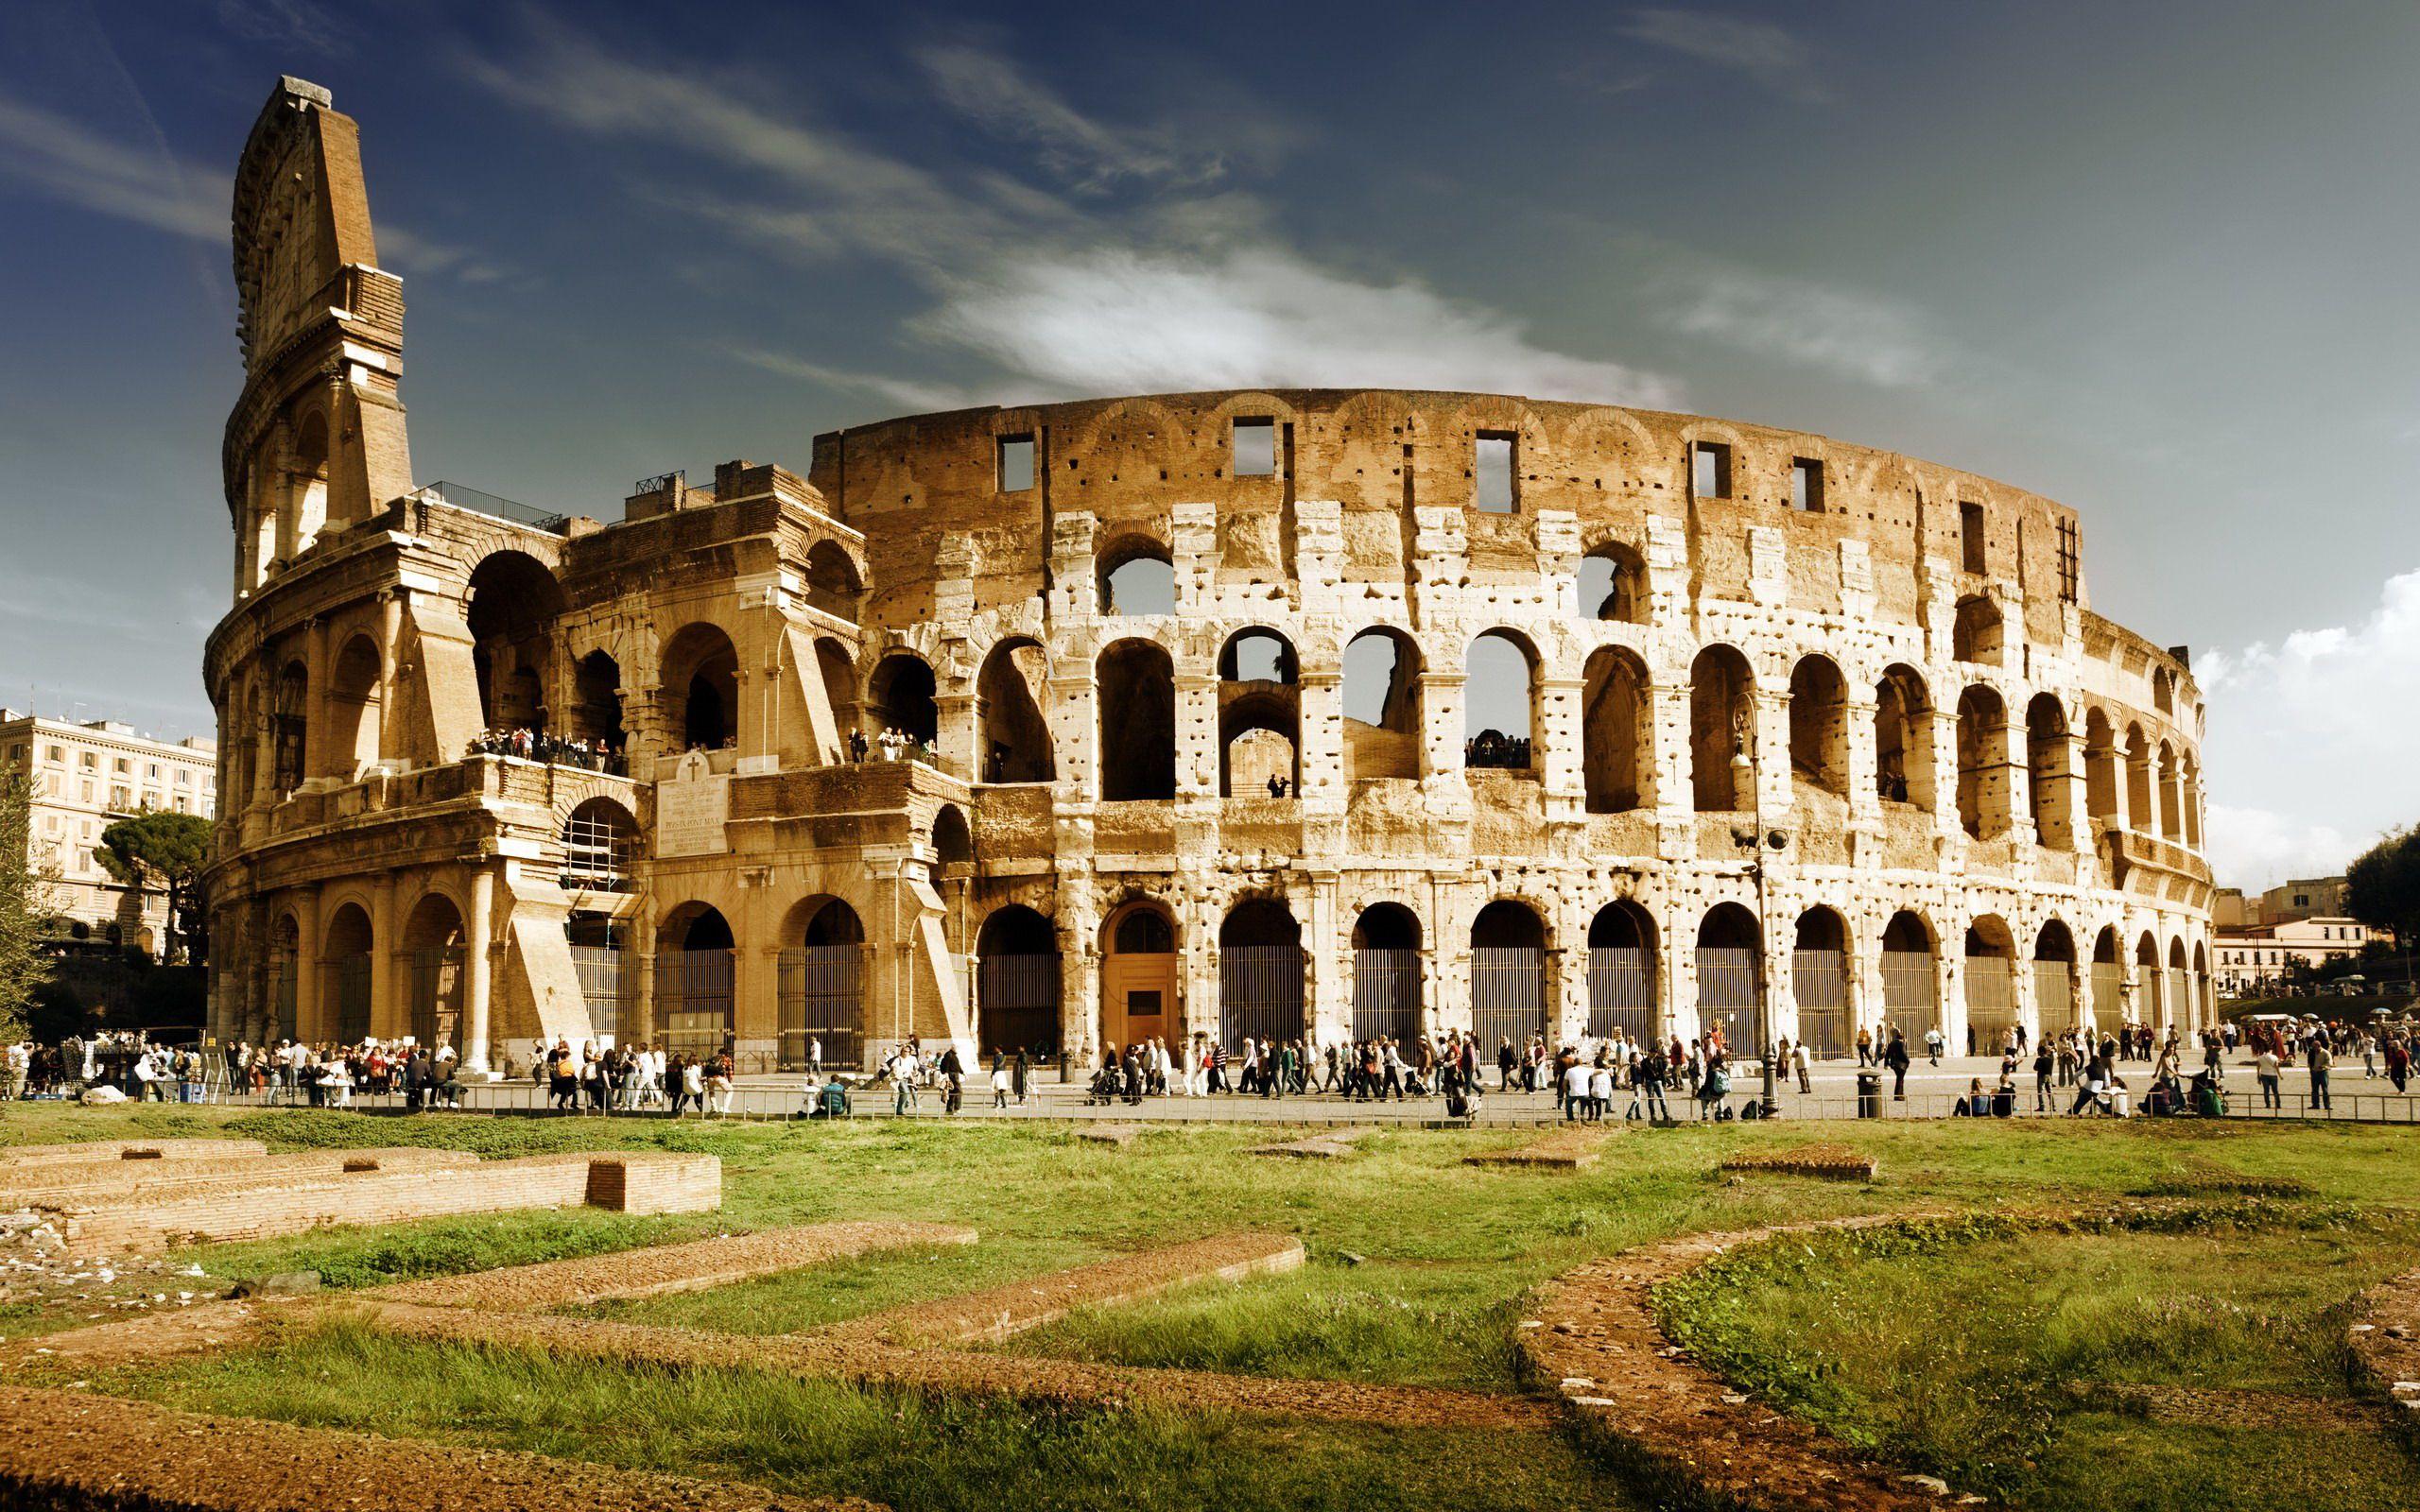 https://0201.nccdn.net/1_2/000/000/12b/c70/Rome-Colosium.jpg